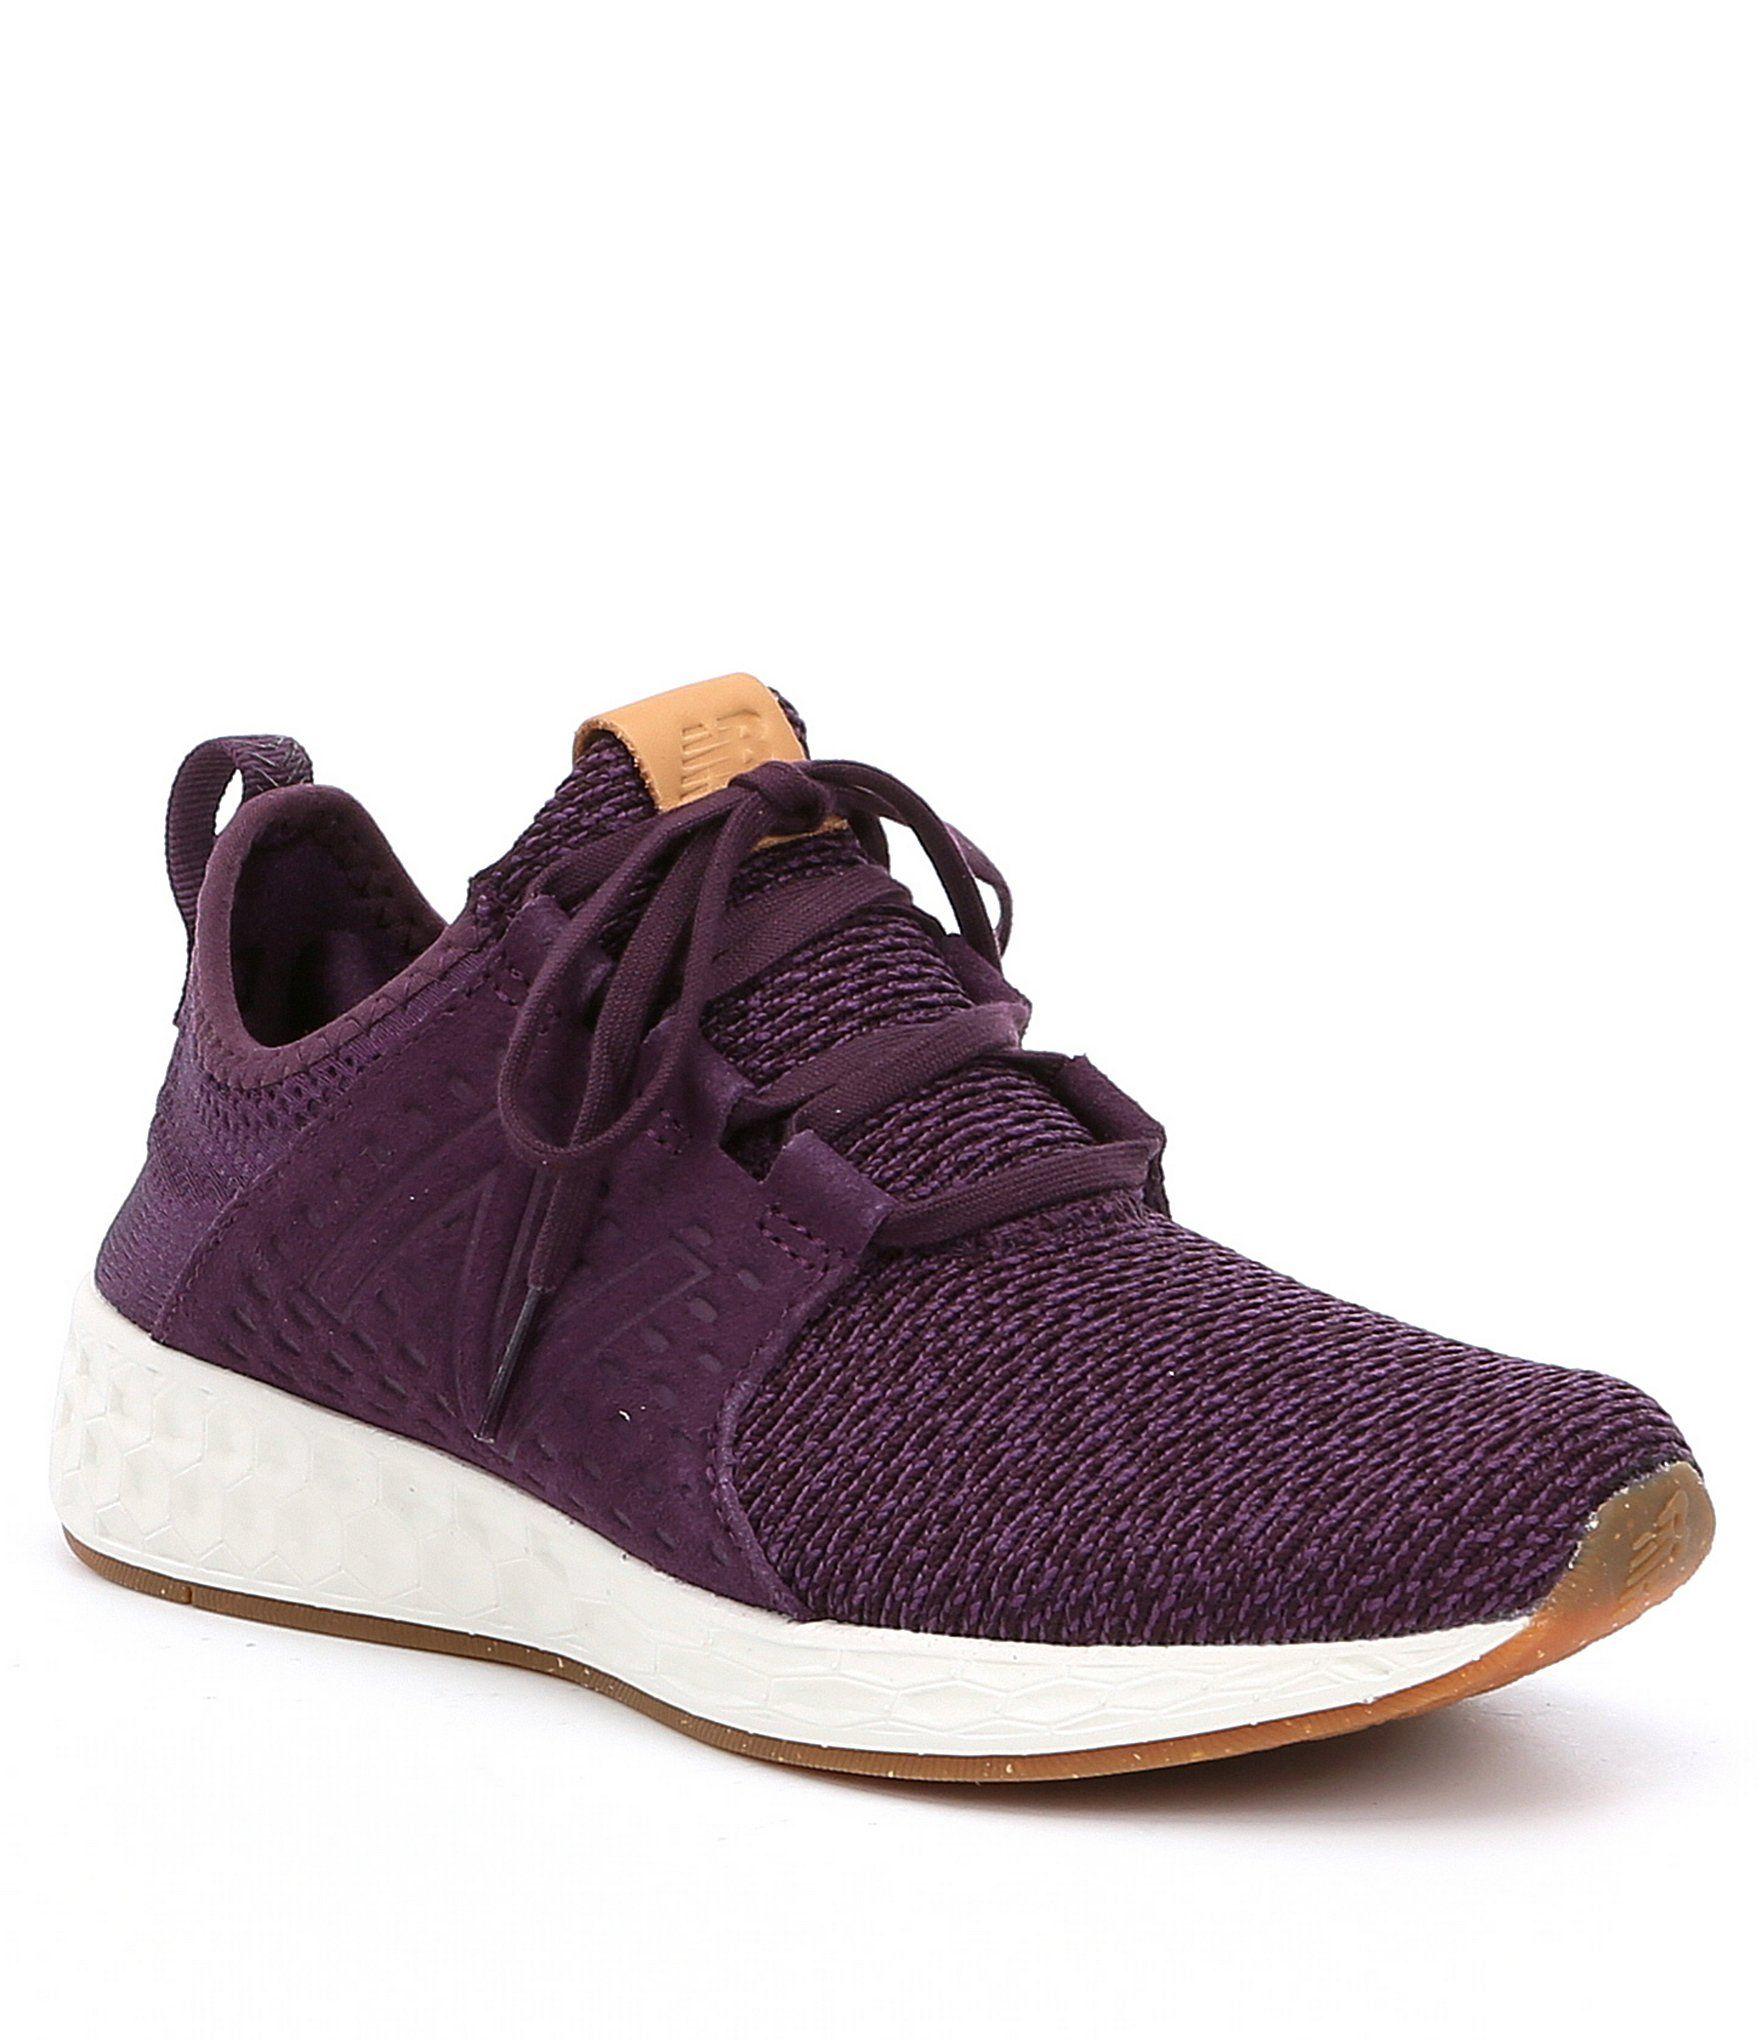 54d0d0b77d3 Shop for New Balance Women´s CRUZv1 Running Shoes at Dillards.com. Visit  Dillards.com to find clothing